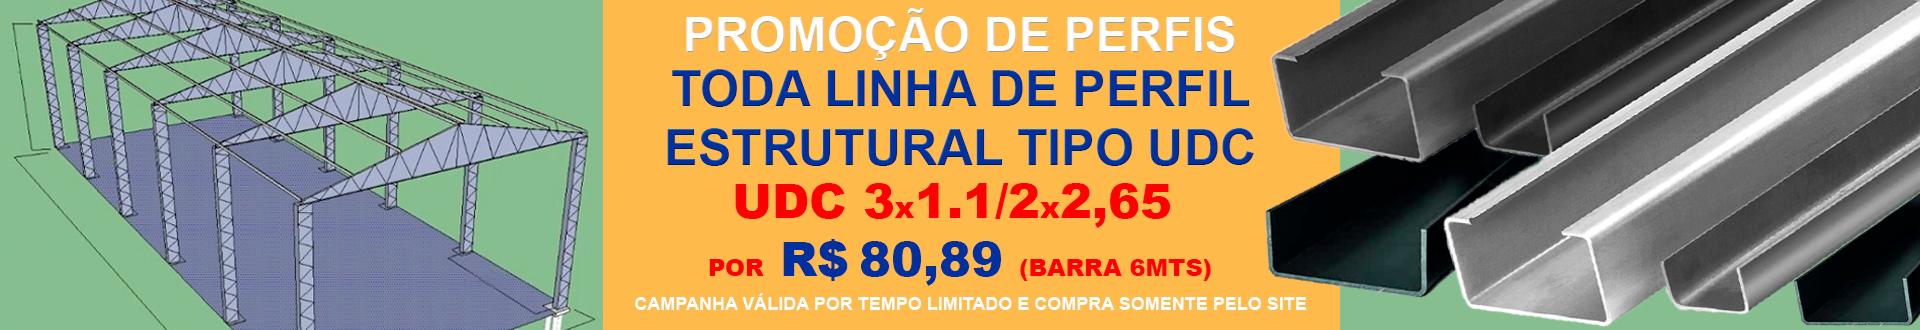 2019-05-28-banner-1920x330-fundo-laranja---desconto-CAMPANHA-MAIO-E-ABRIL-perfil-estrutural